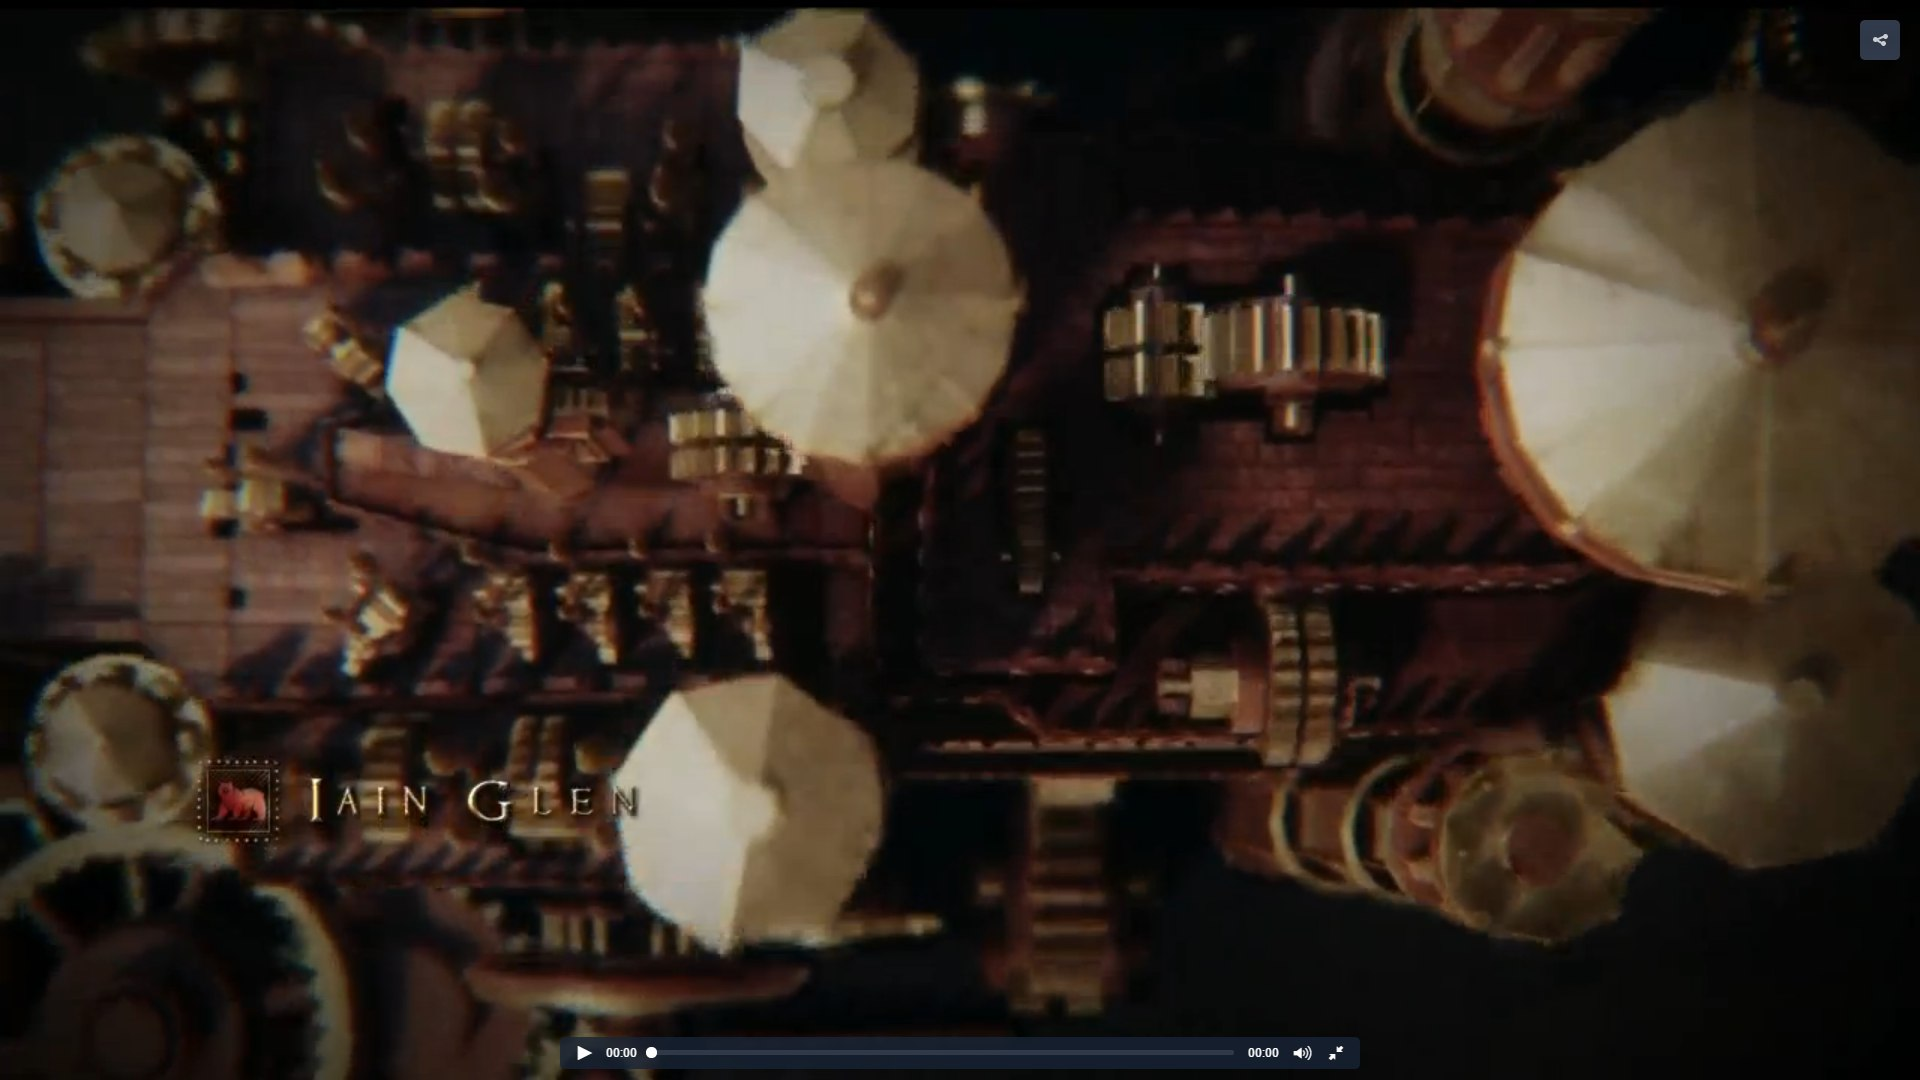 Oshibki Na Sajte All Episodes Serialy Onlajn V Hd Kachestve Images, Photos, Reviews